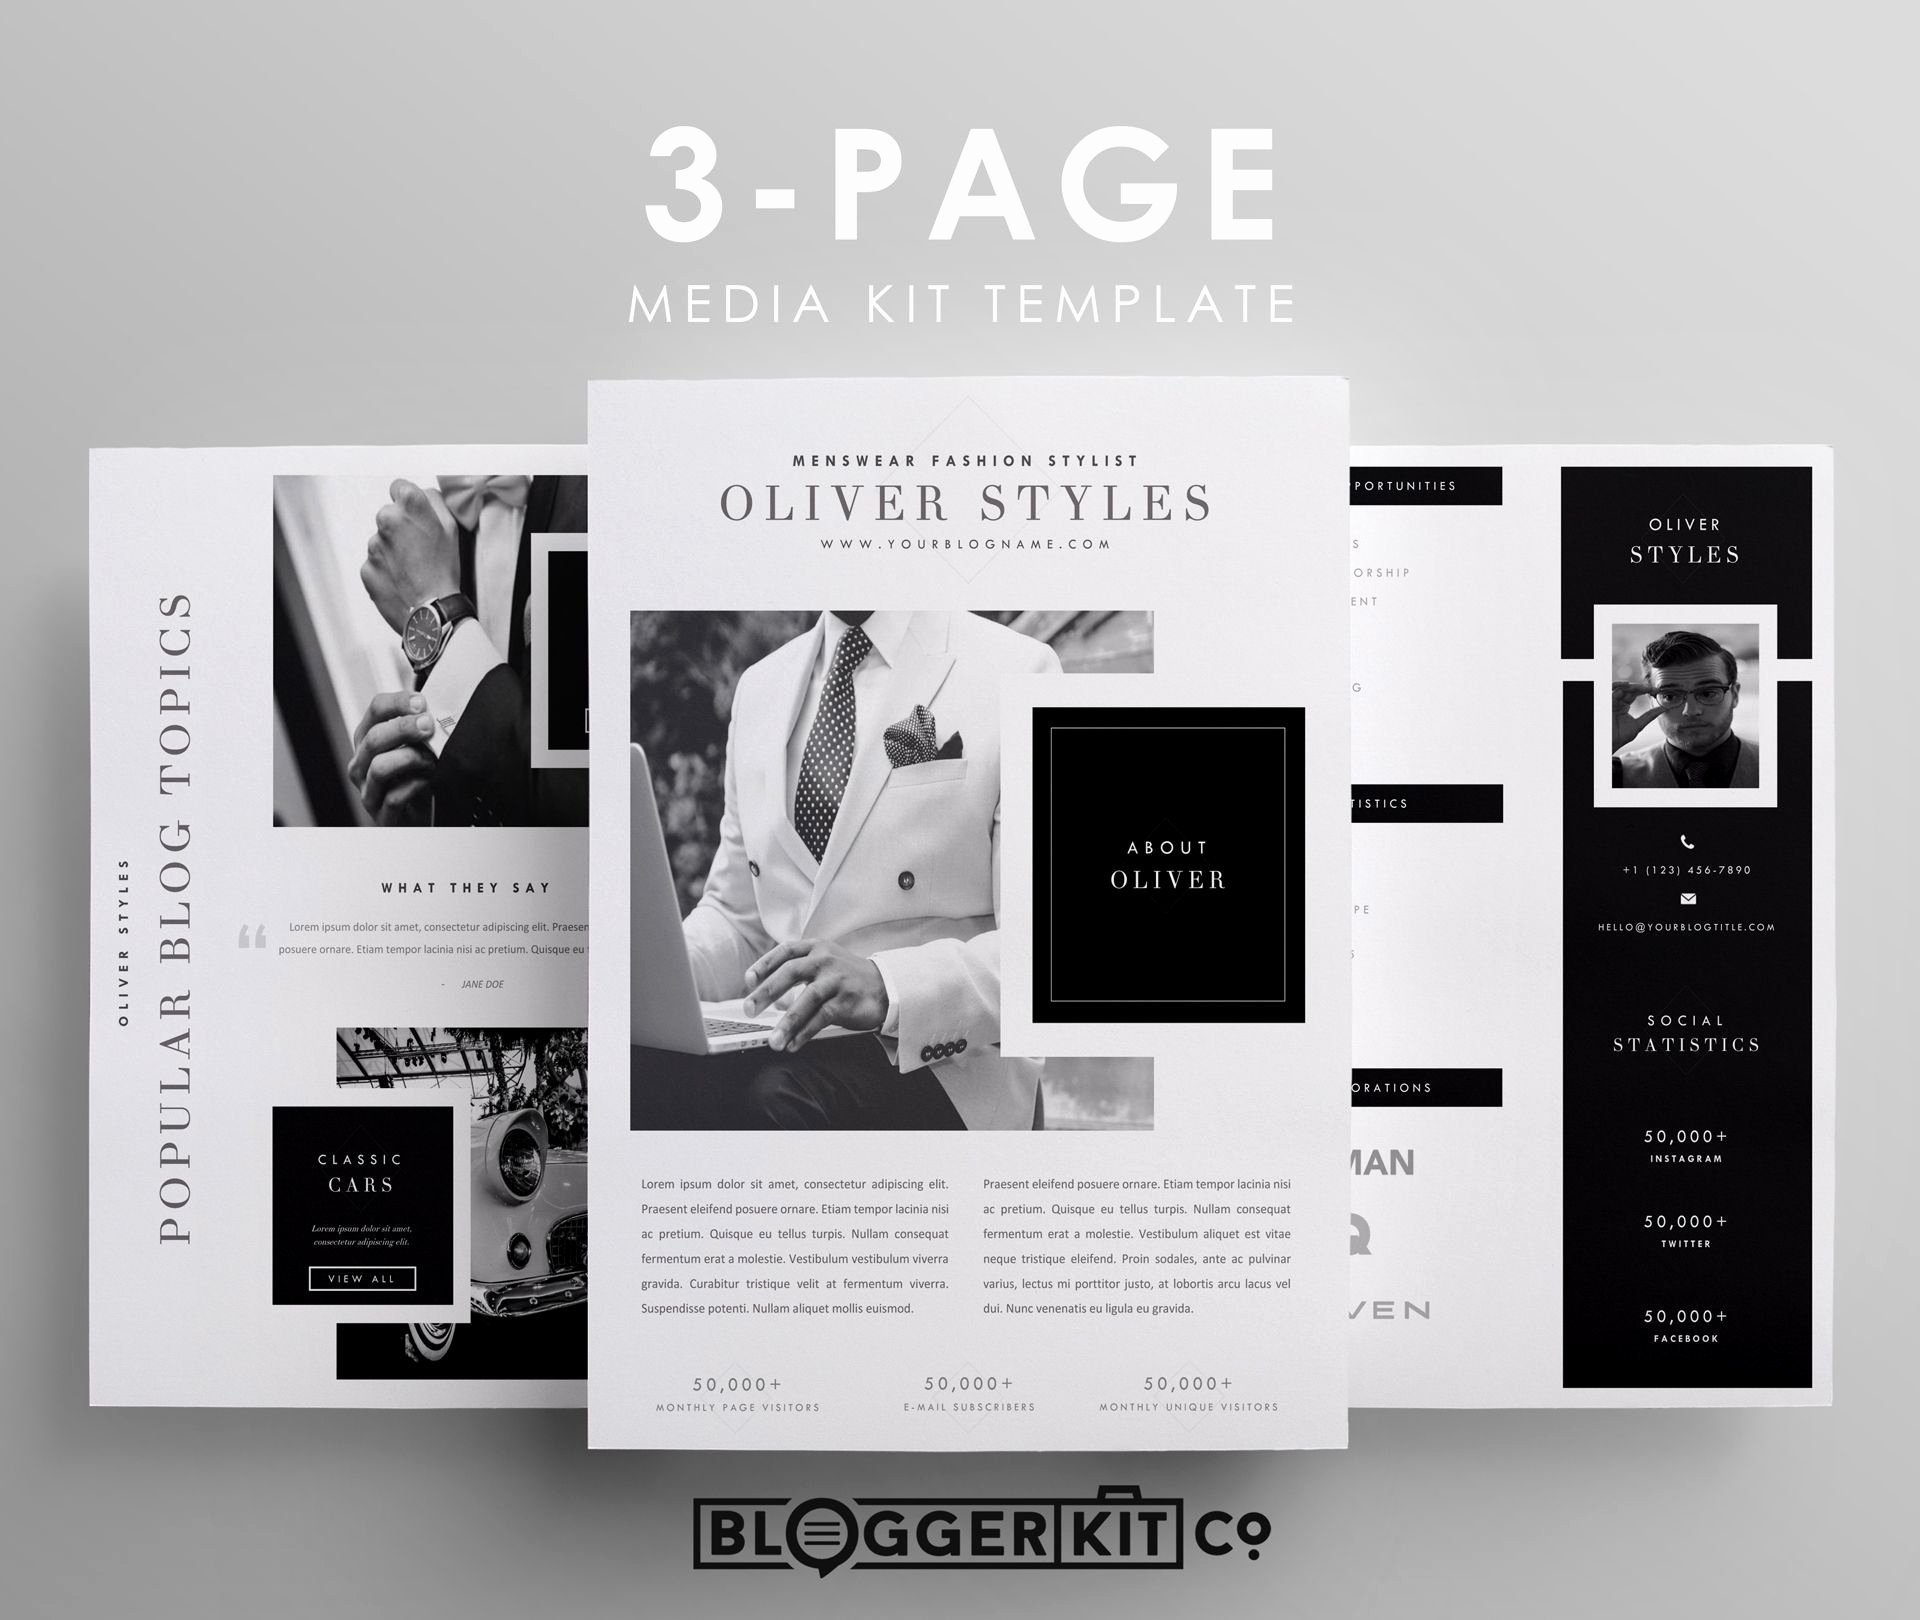 Book Press Release Template Best Of Dapper Media Kit Templates Tips